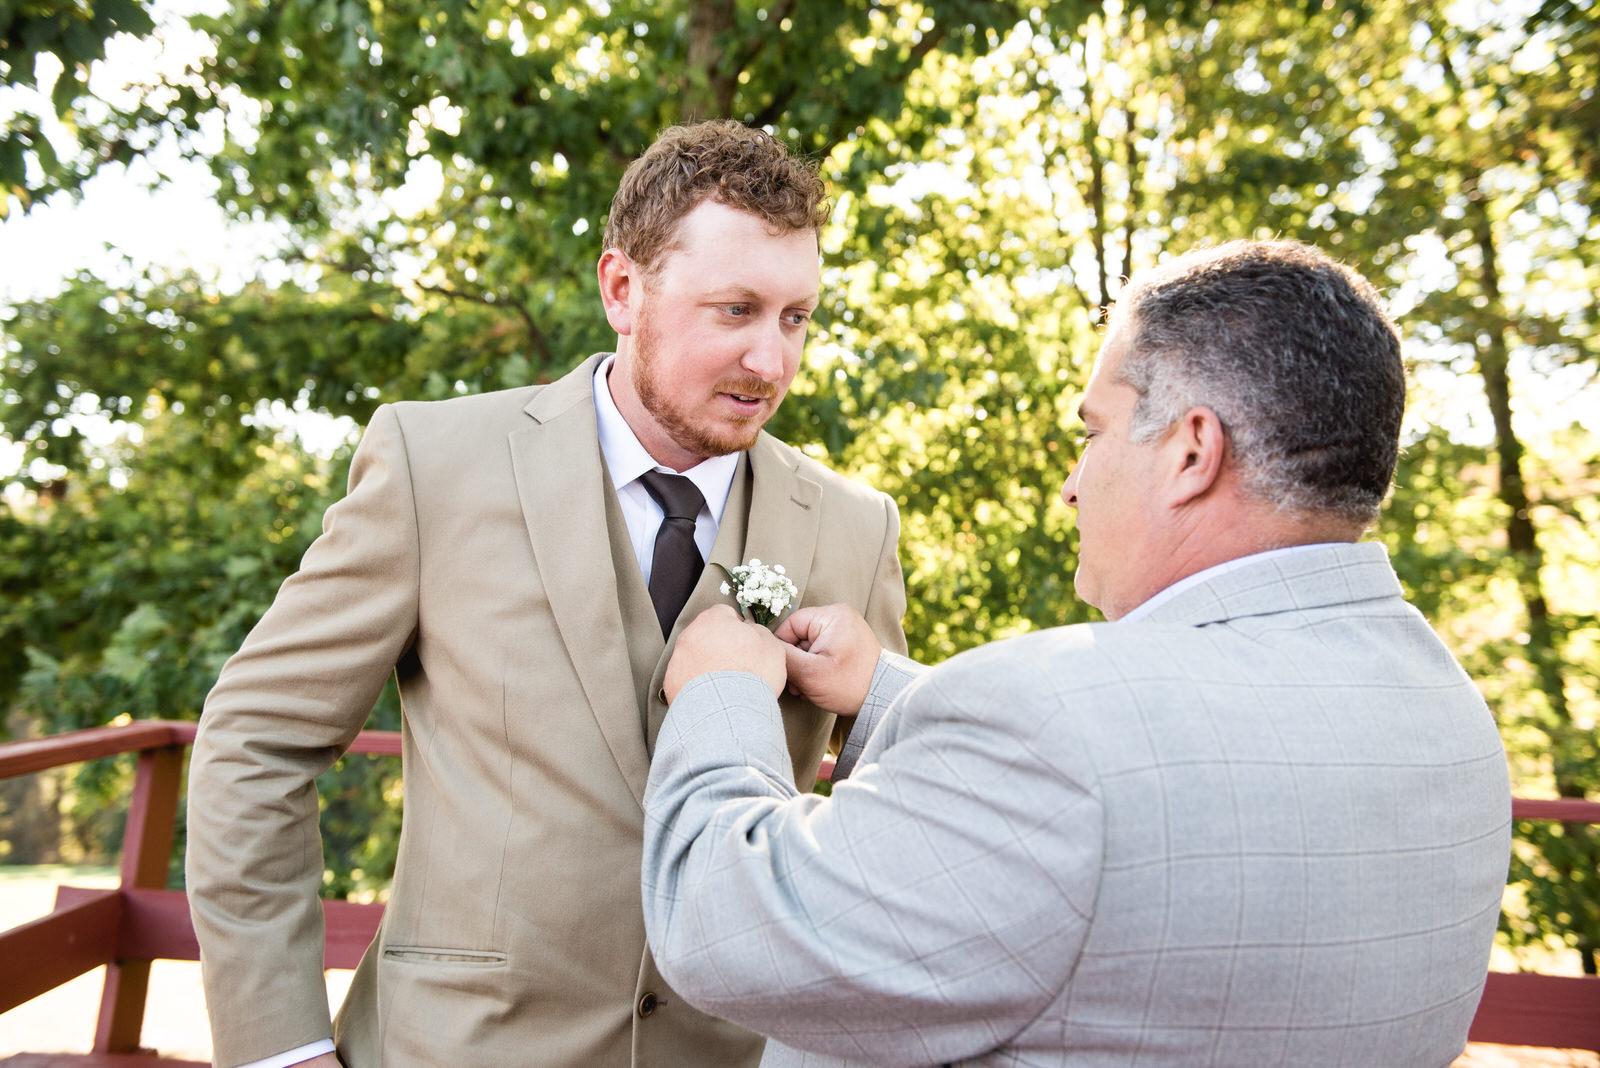 wedding_at_red_fox_winery_wedding_photographer016.jpg